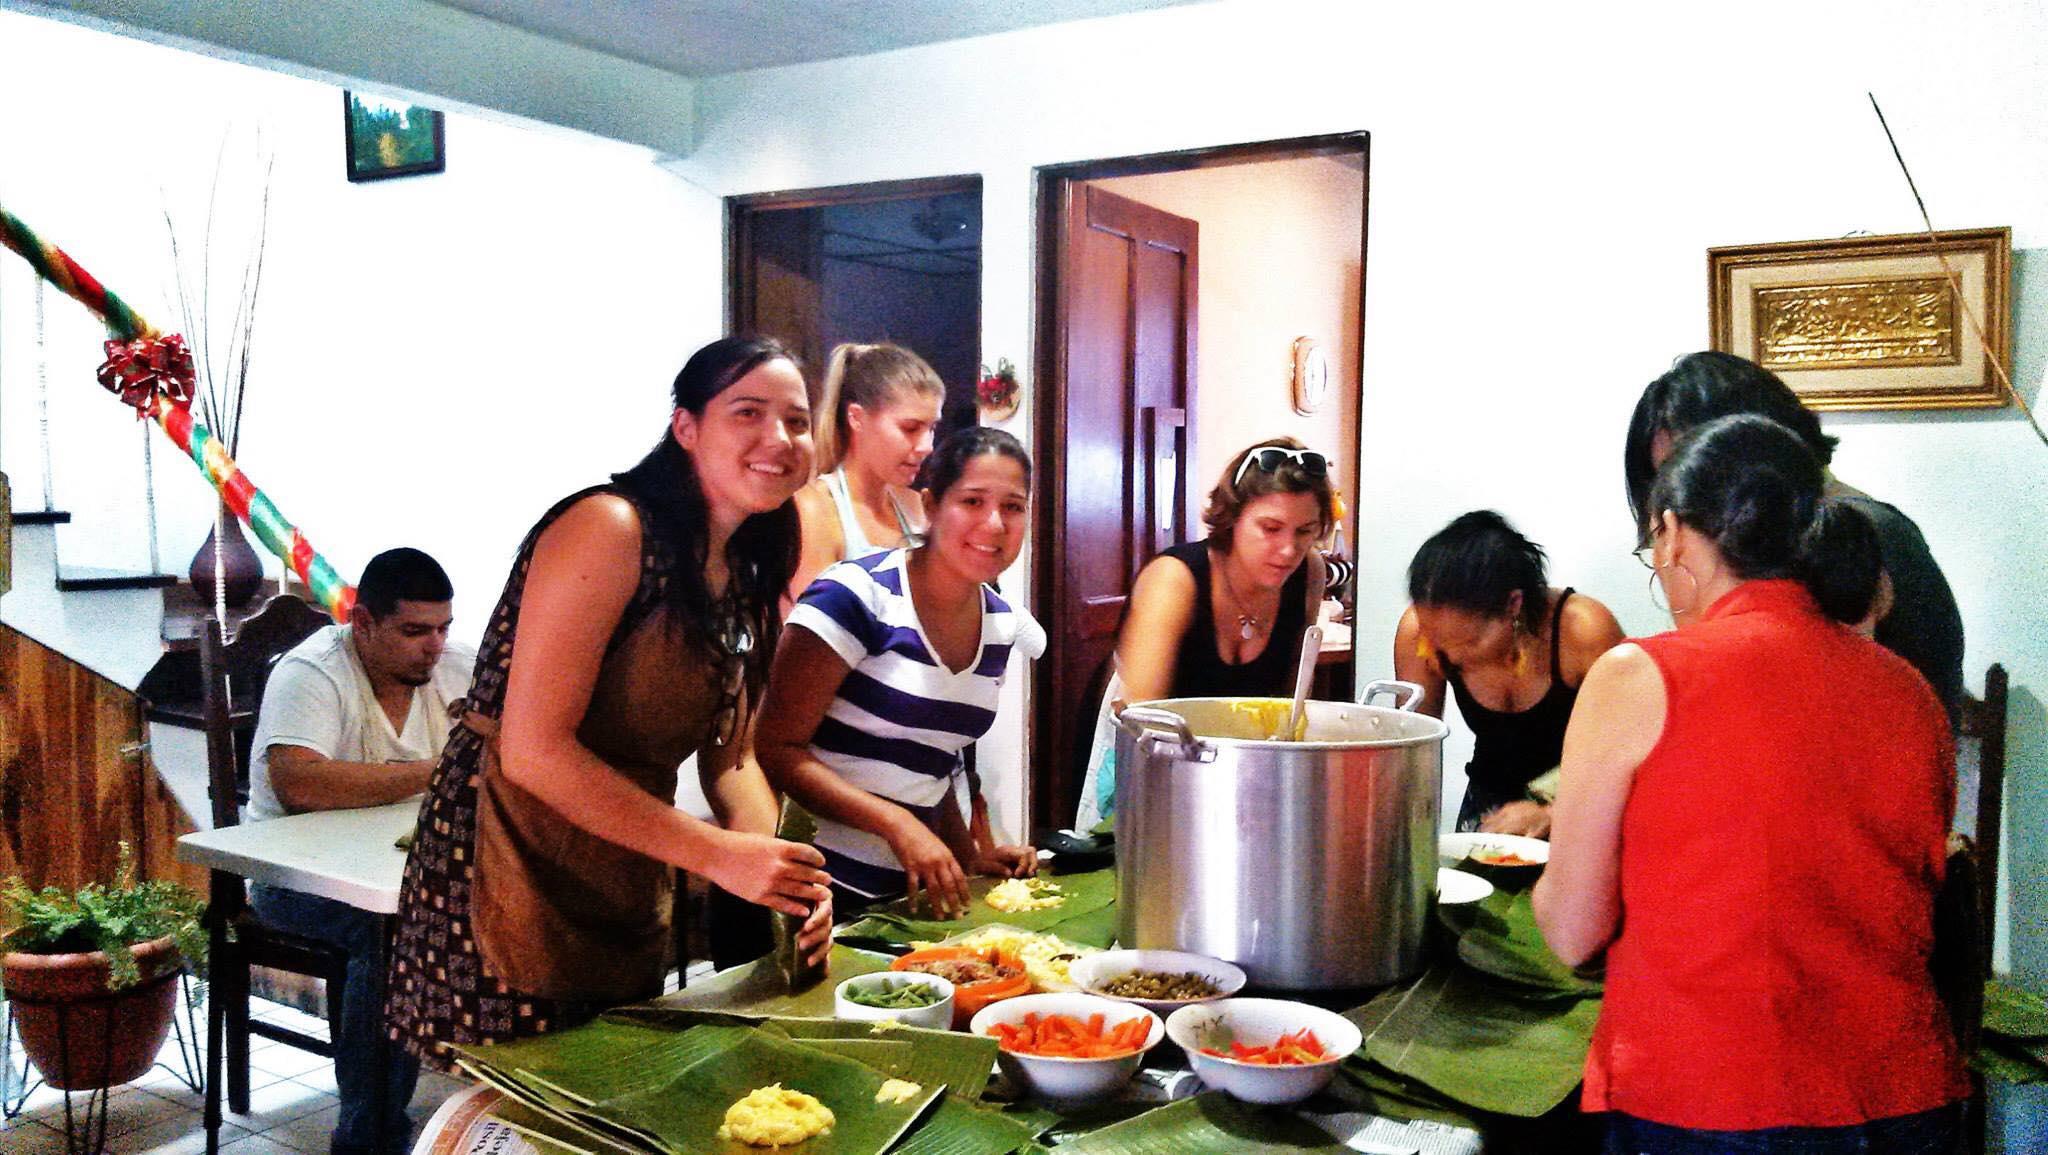 Making tamales in Costa Rica. Photo credit: Melanie Faith